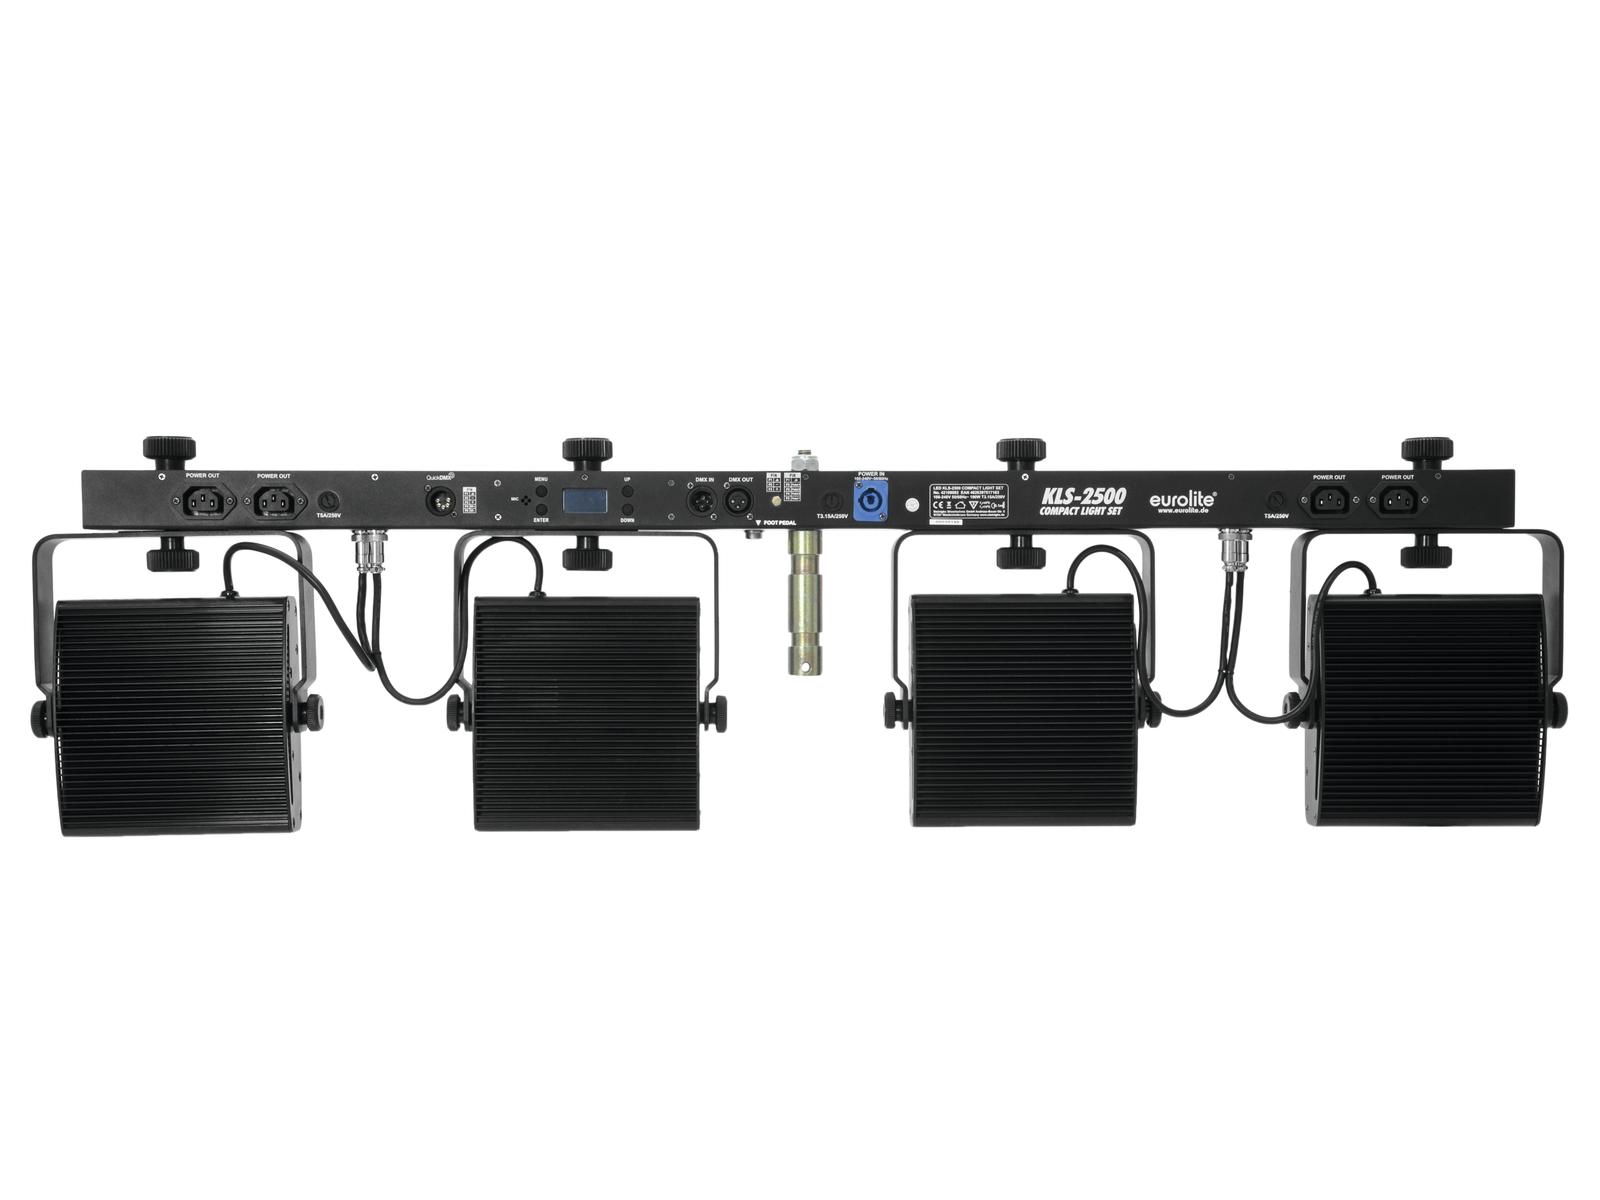 EUROLITE LED KLS-2500 Compatto e Leggero